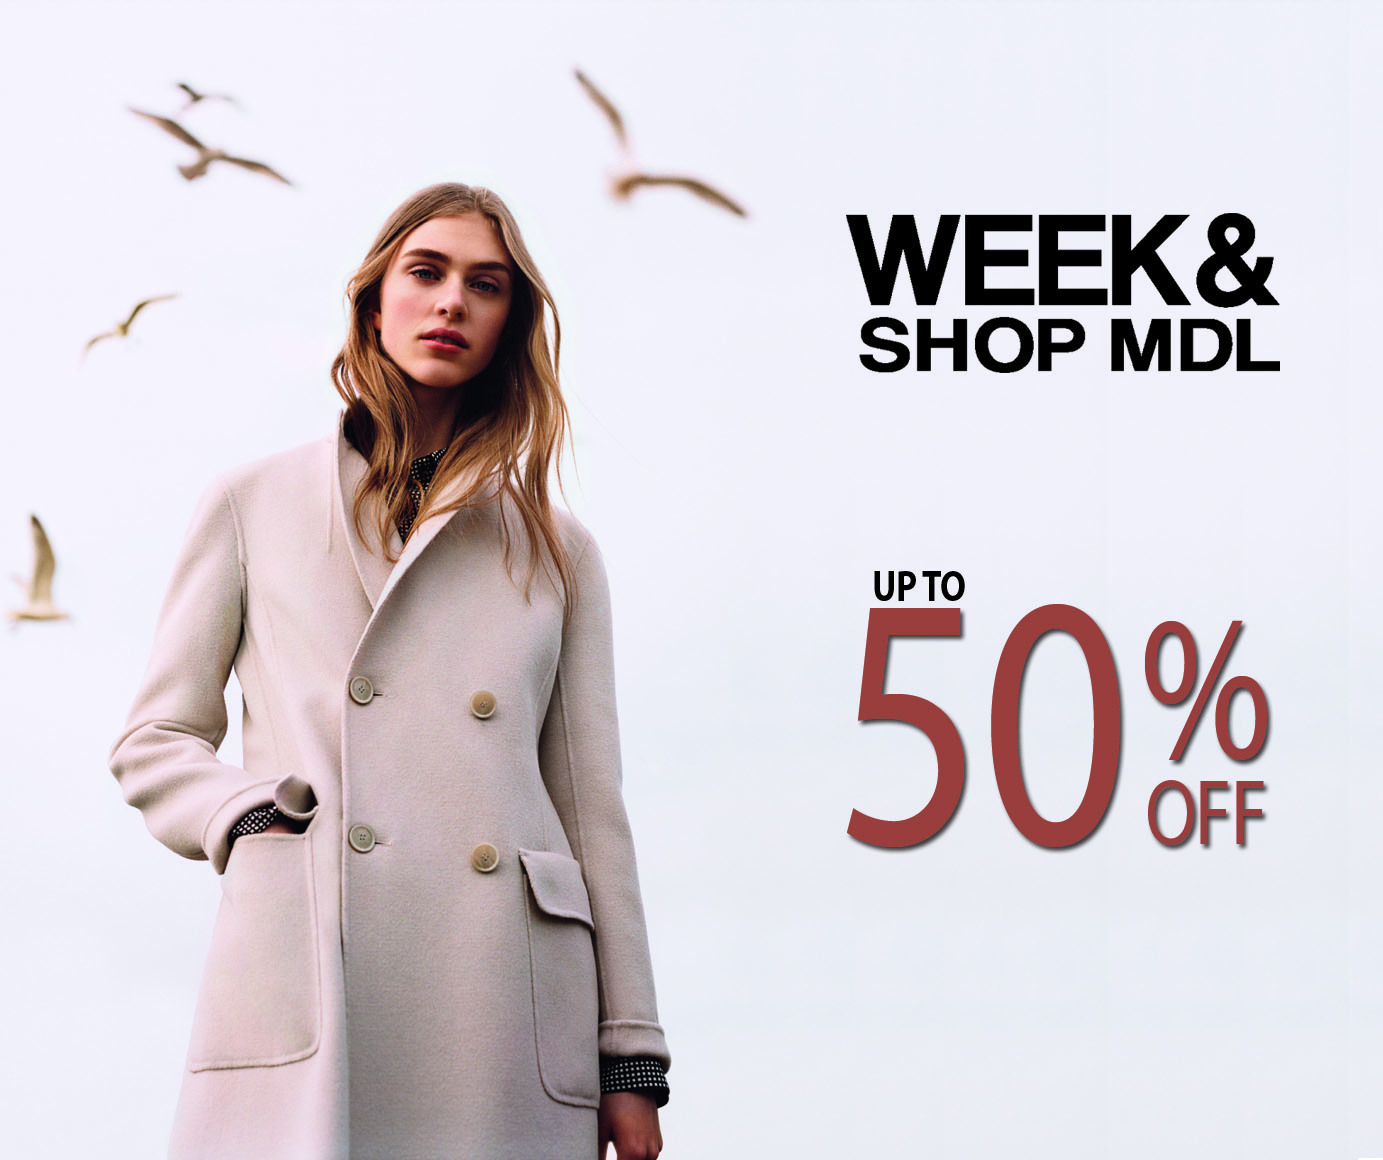 Week&Shop MDL с до 50% намаление